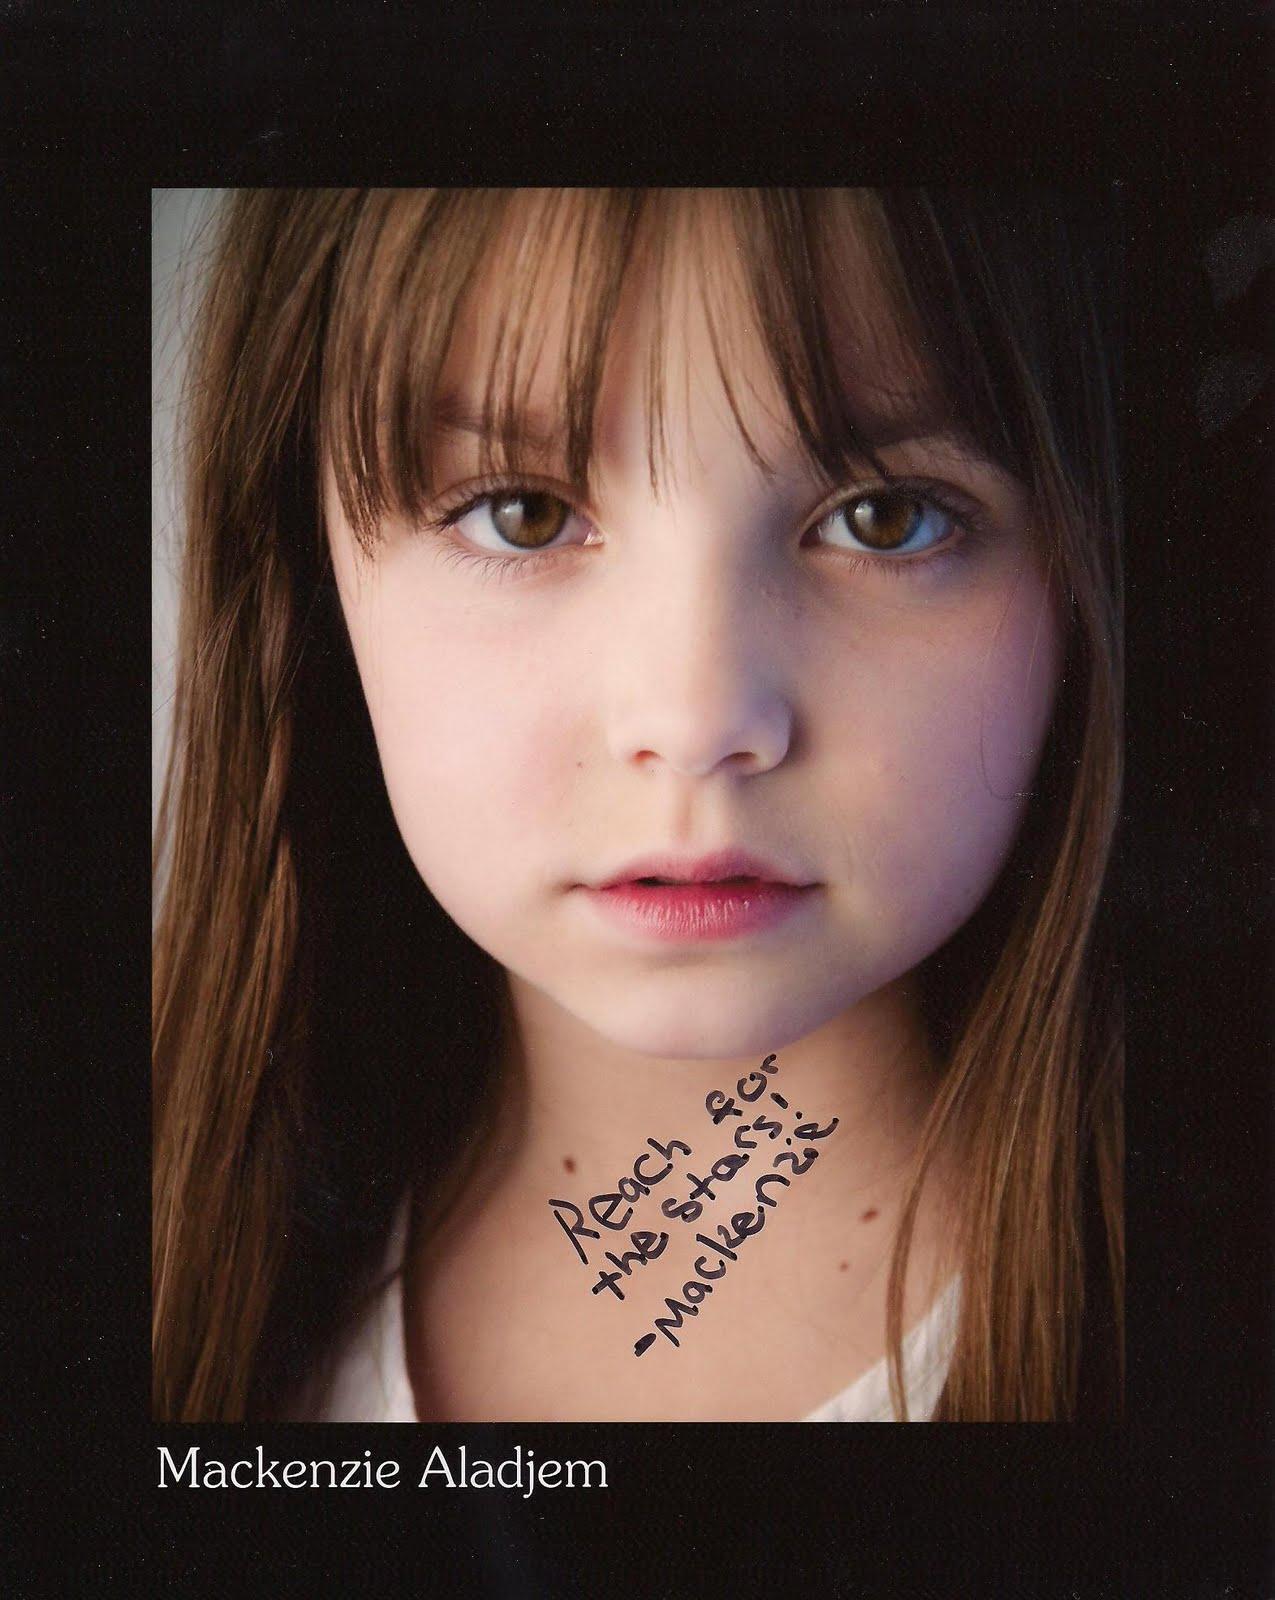 http://4.bp.blogspot.com/-ZwpinzynNH0/TZ-prjUog7I/AAAAAAAAGJw/ugmaAByOBgE/s1600/Mackenzie%25252BAladjem%25252BAutograph.jpg